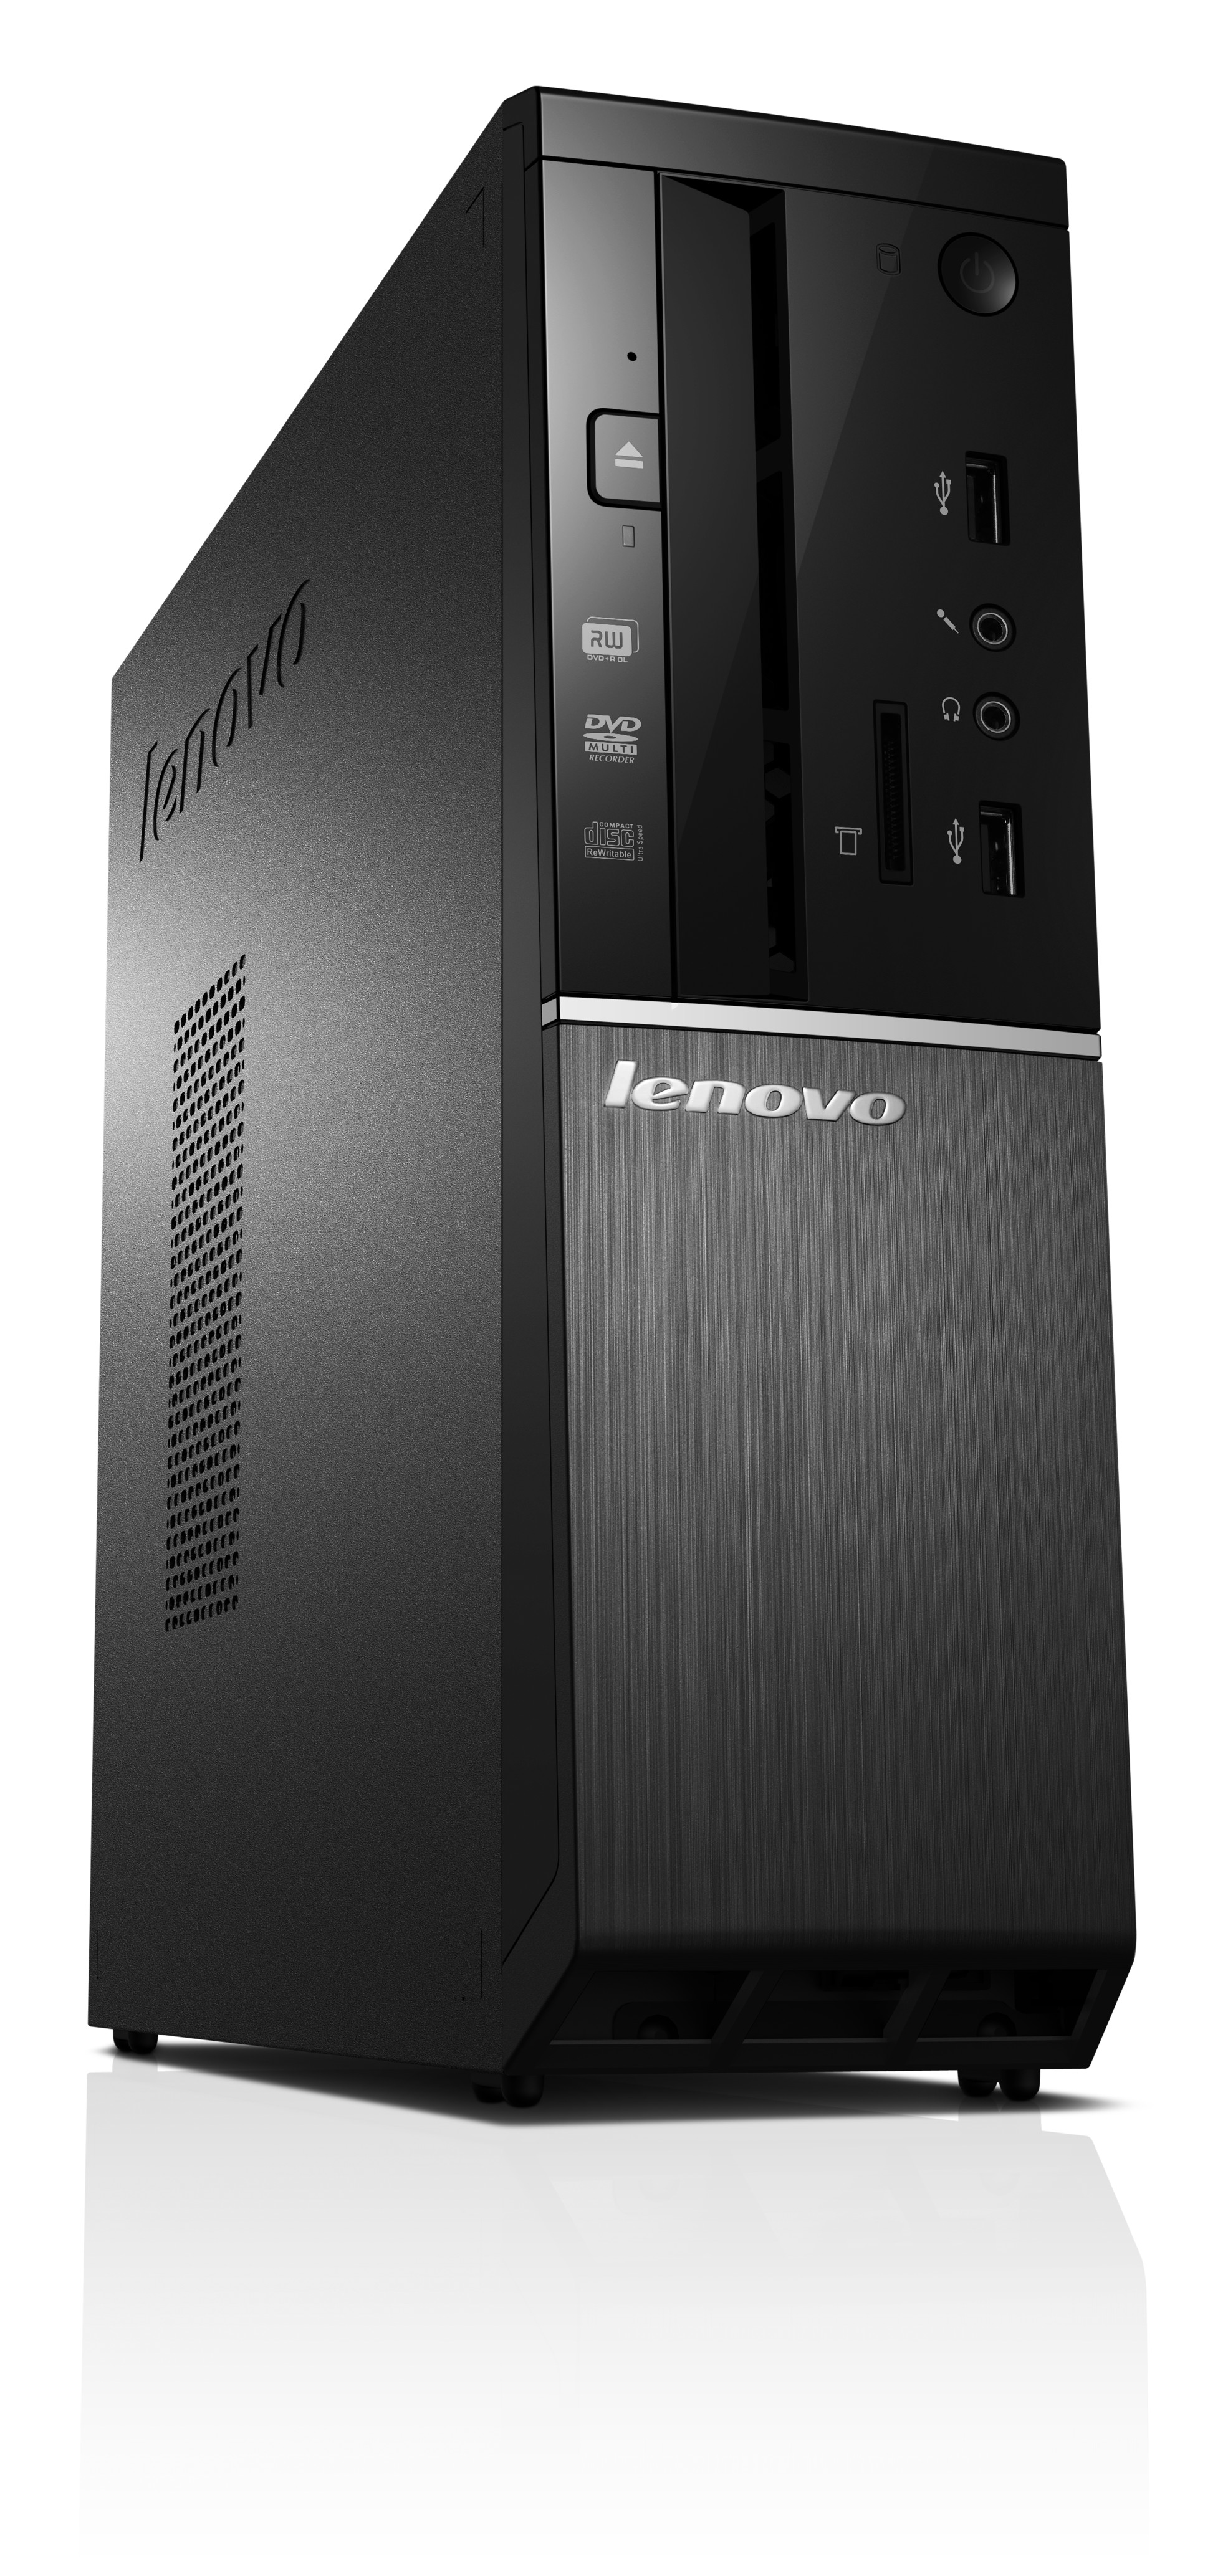 Lenovo IdeaCentre 300s/G3260/4G/1TB/INT/DVD/ WIN10